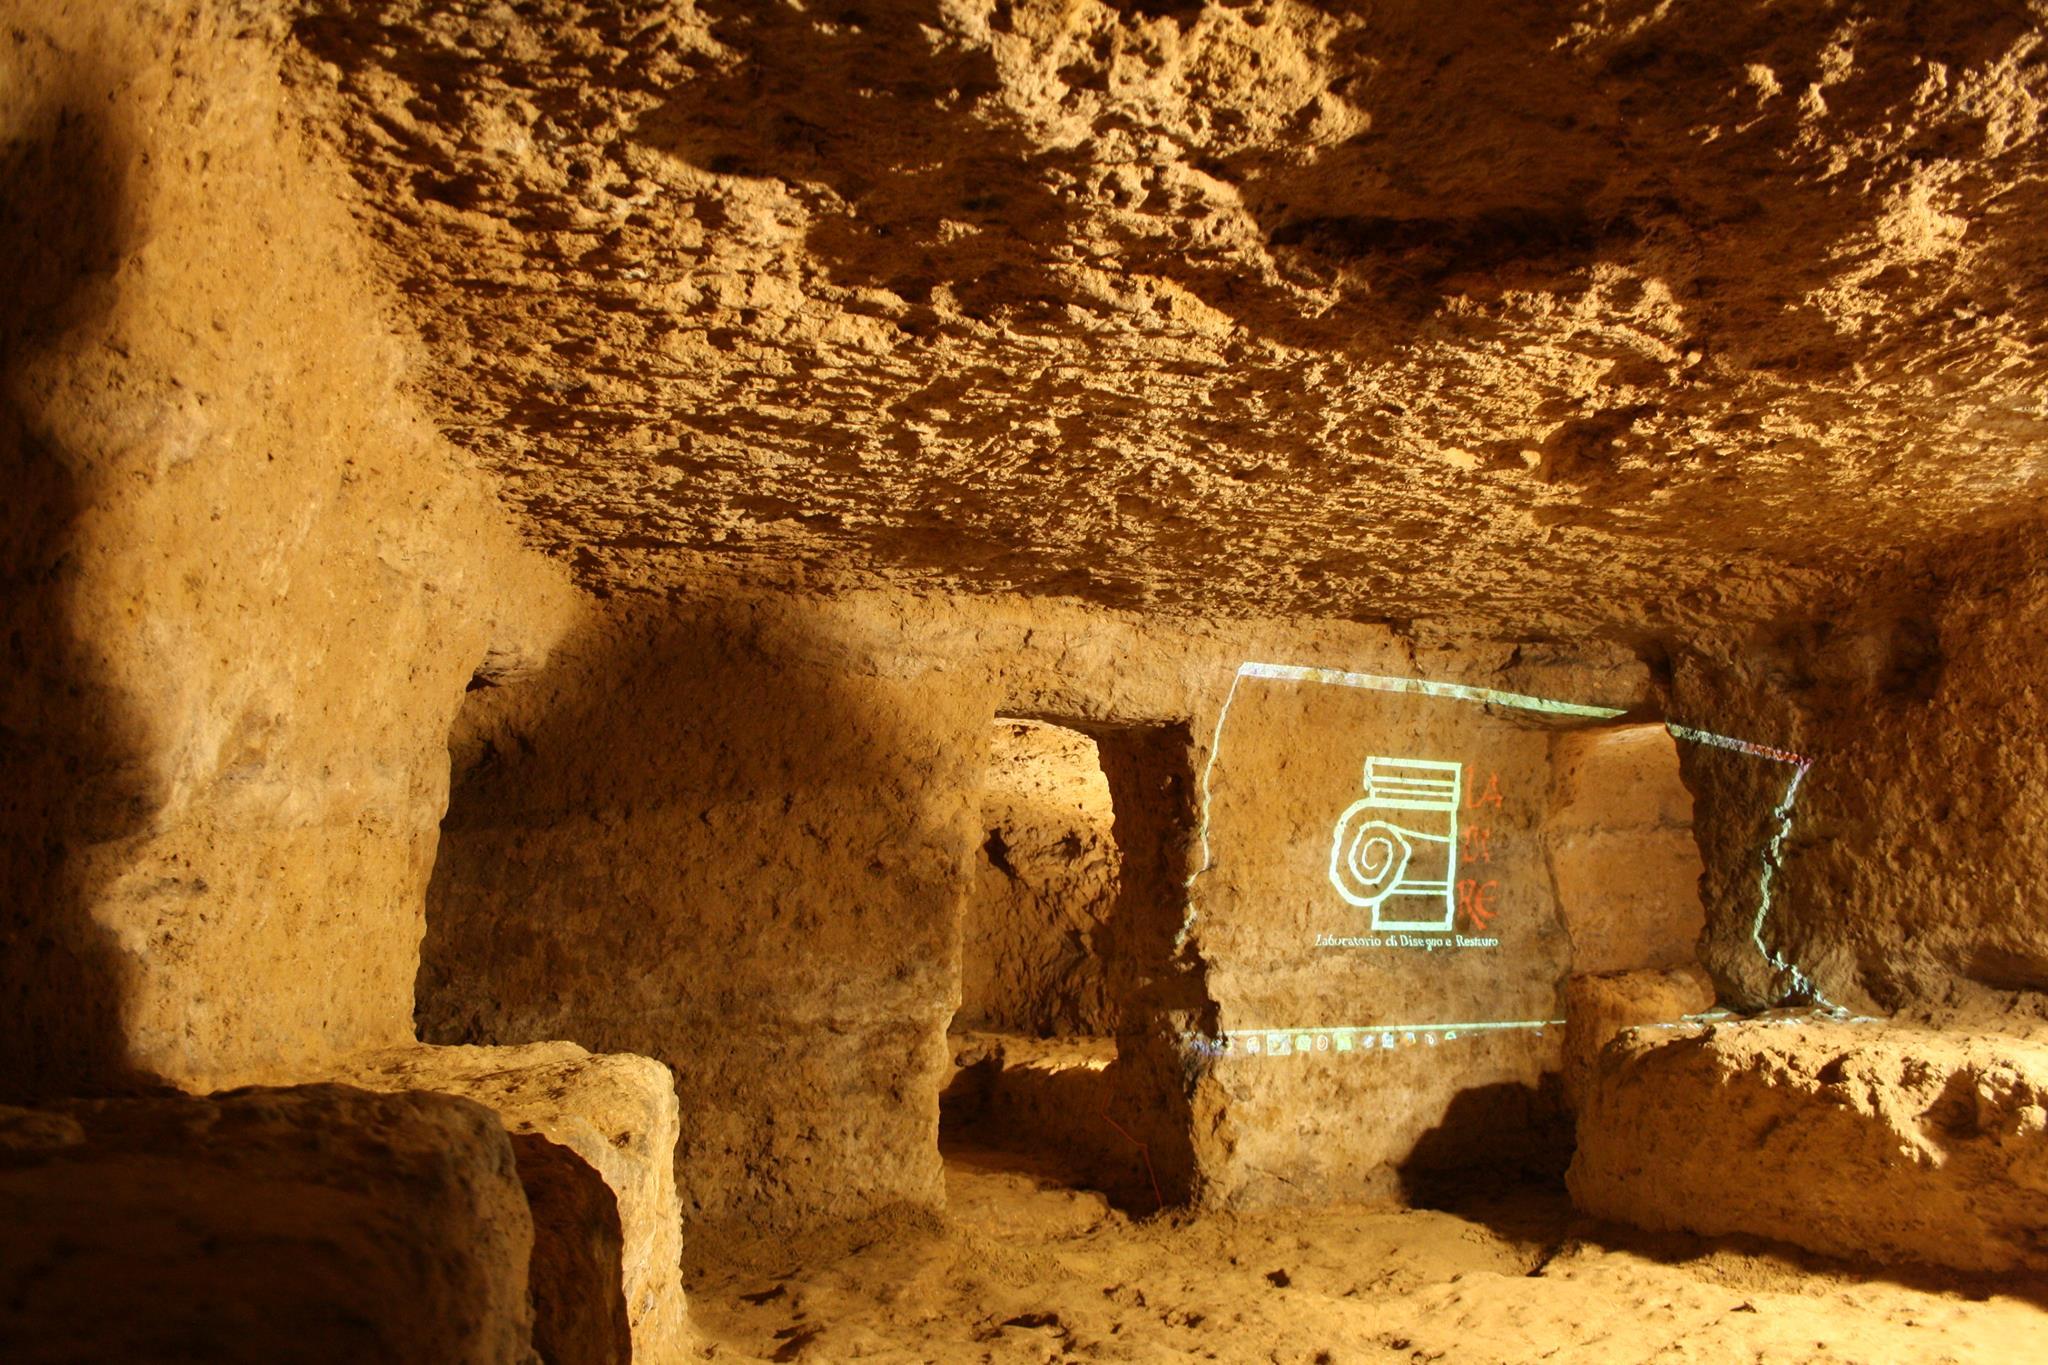 Due Tombe etrusche a Volterra: Tomba Inghirami e Tomba Bianchi